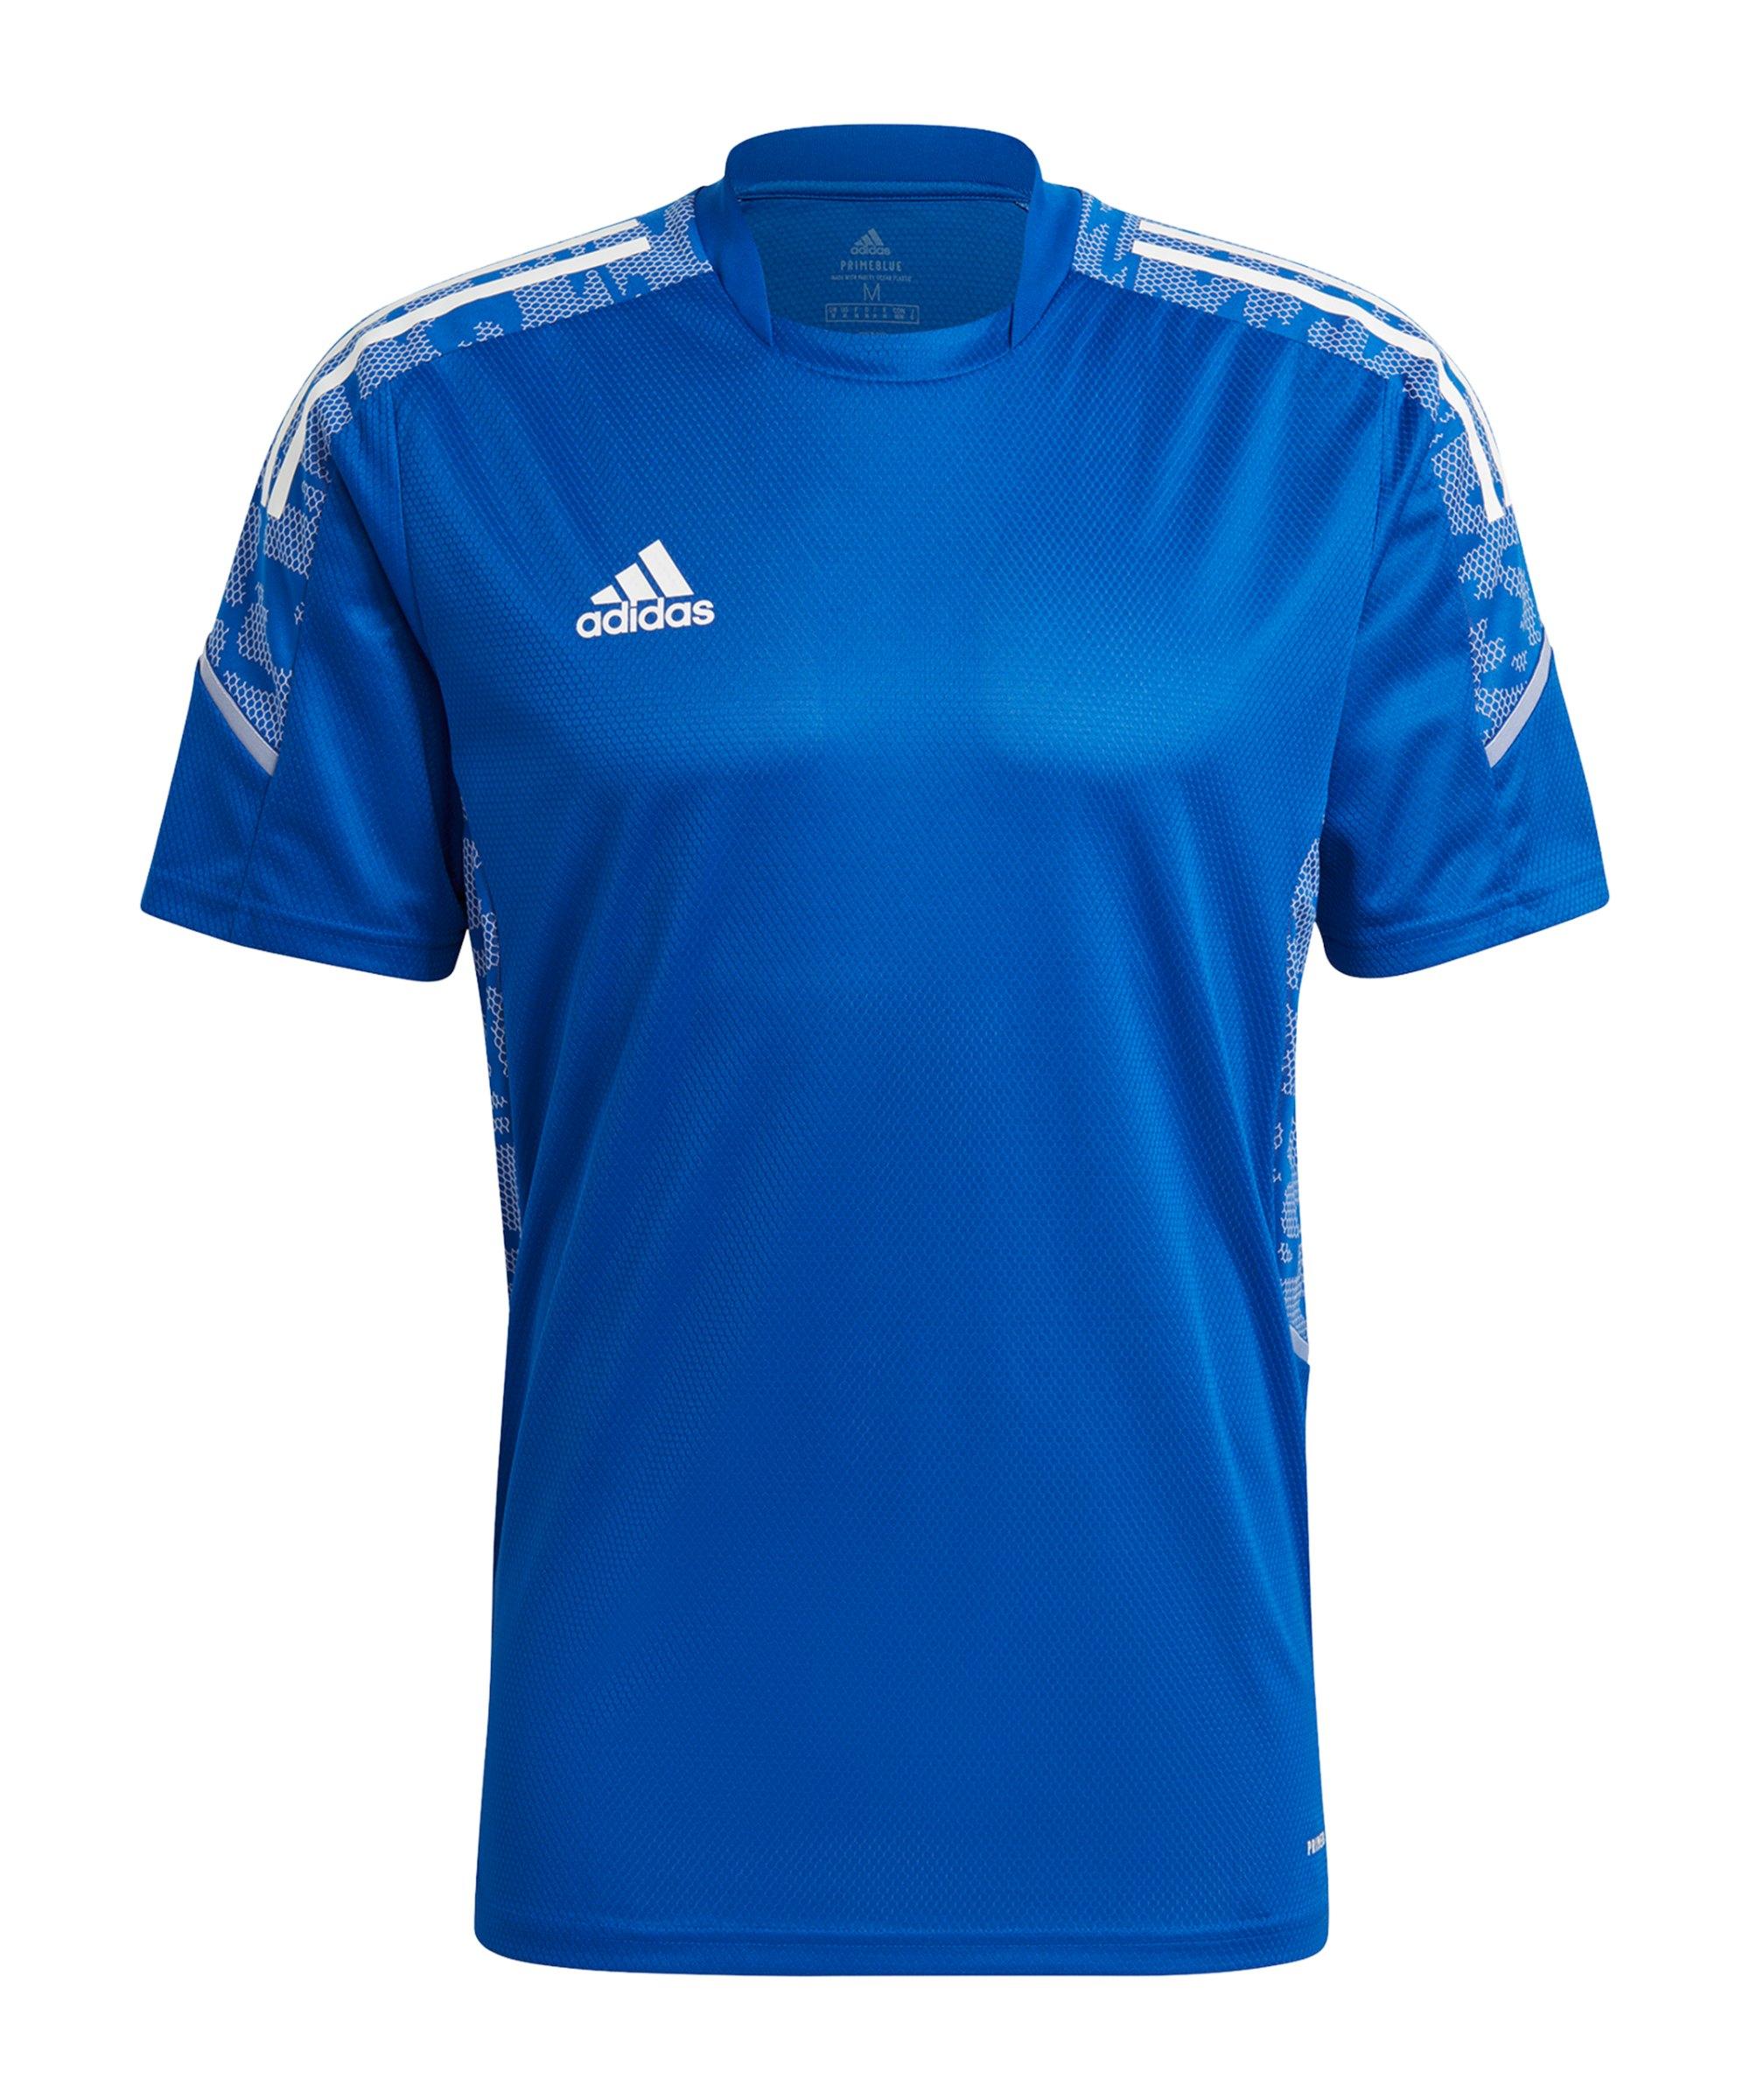 adidas Condivo 21 Trainingsshirt Blau Weiss - blau